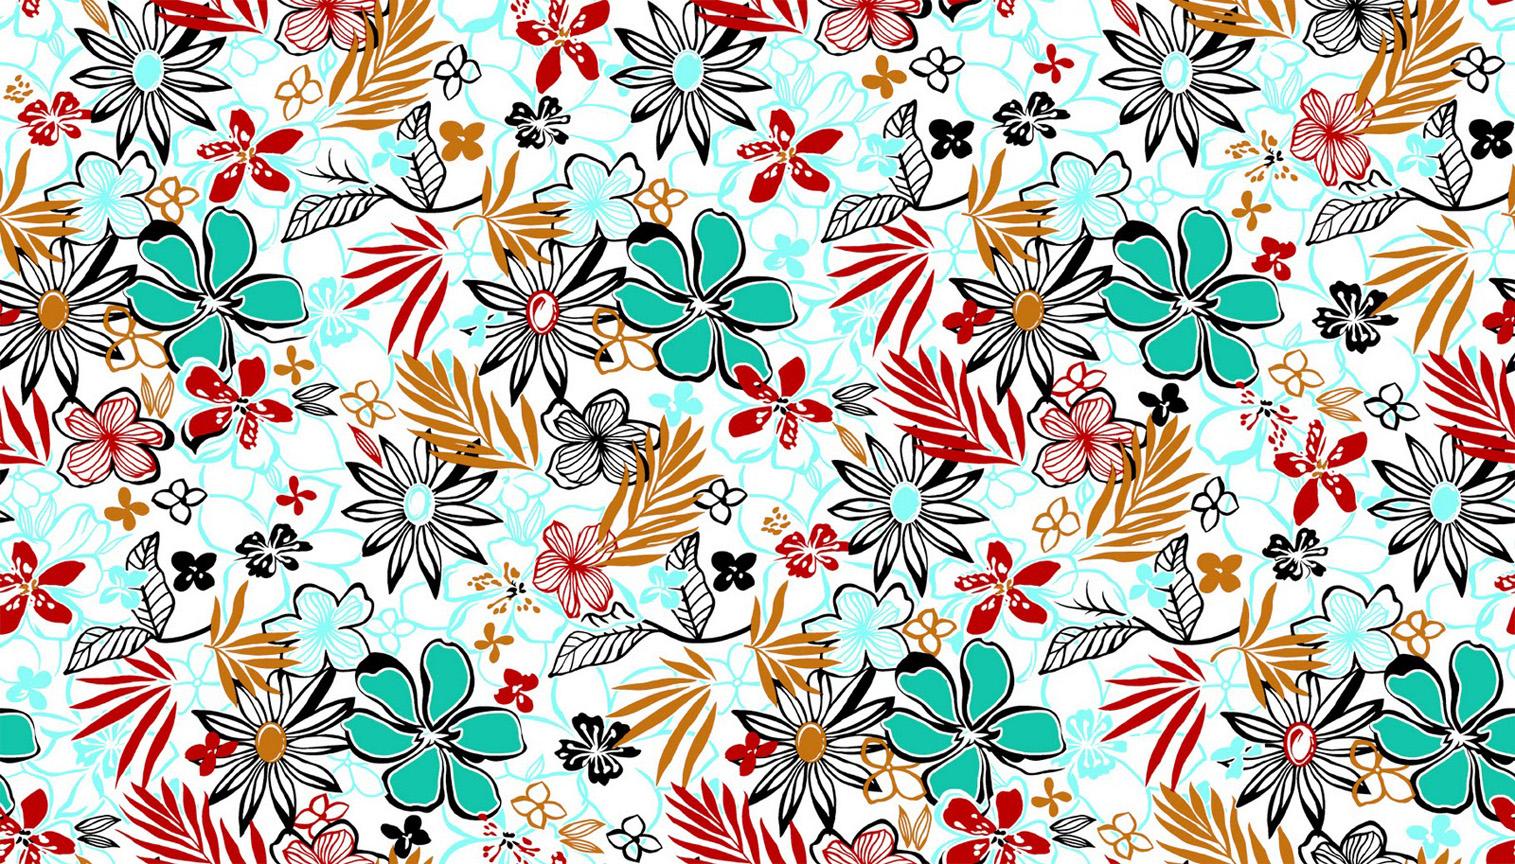 Textile design ideas textile designs samples textile for Fabric designs